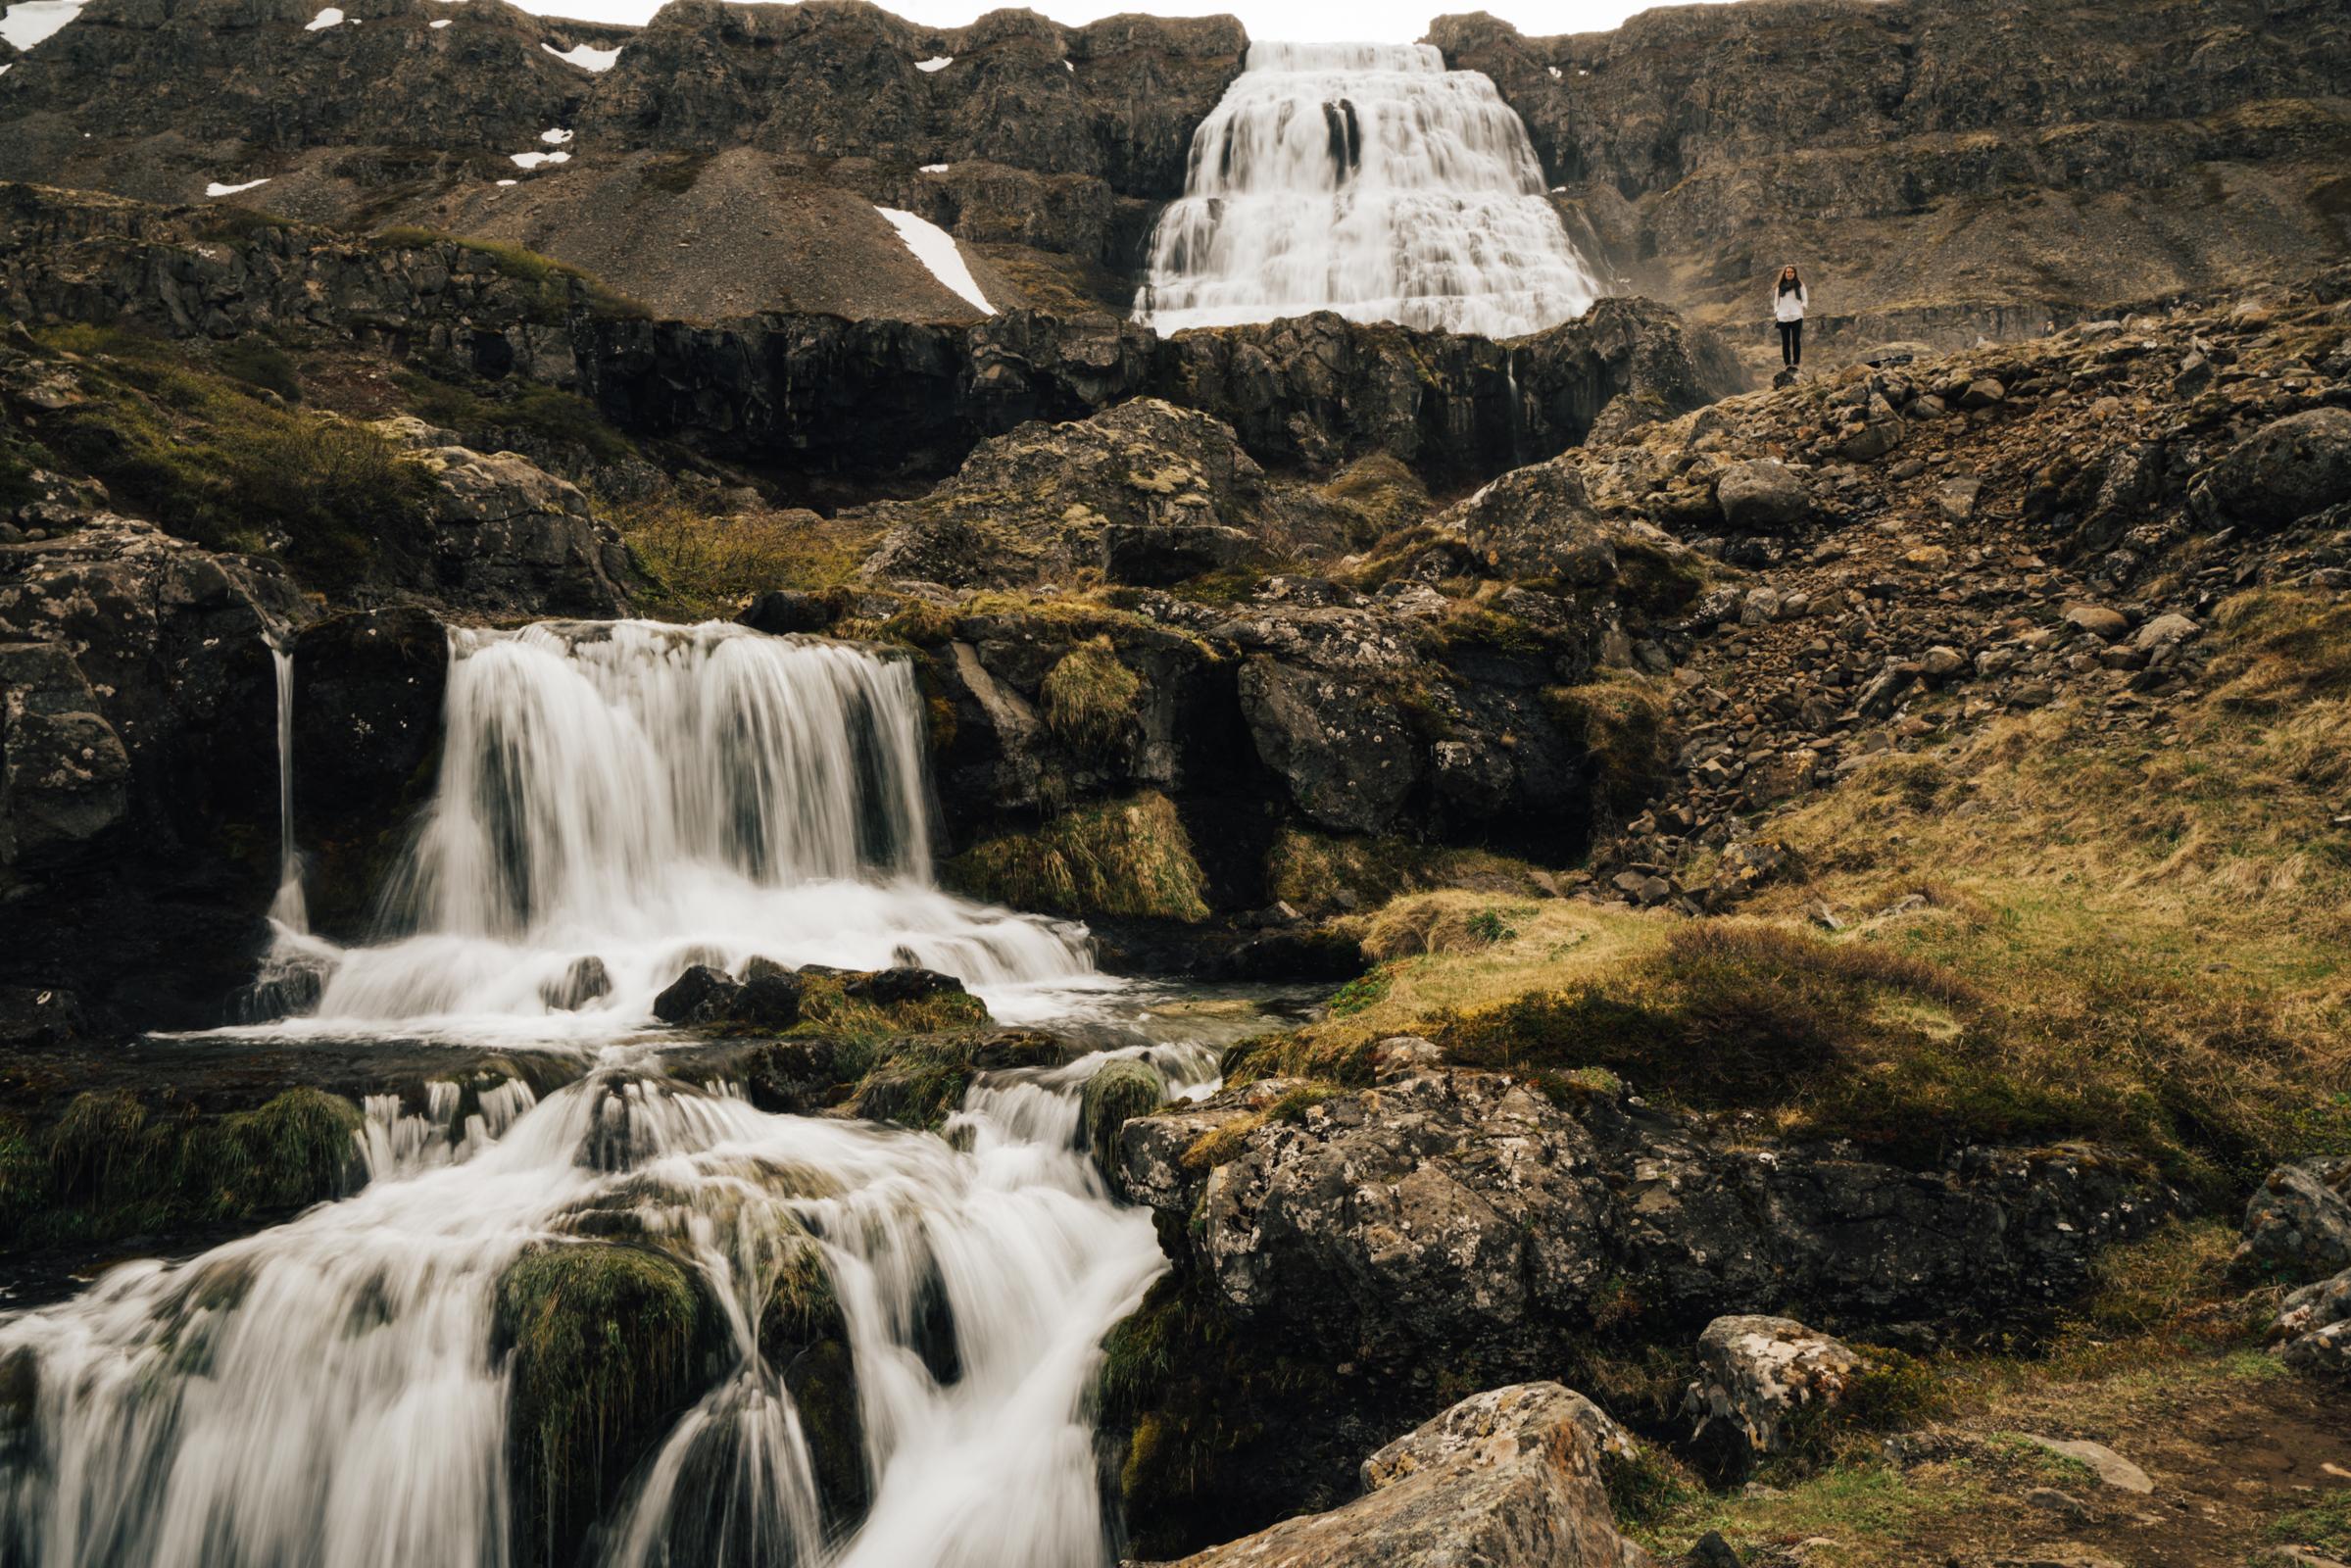 visitwestfjords-6.jpg